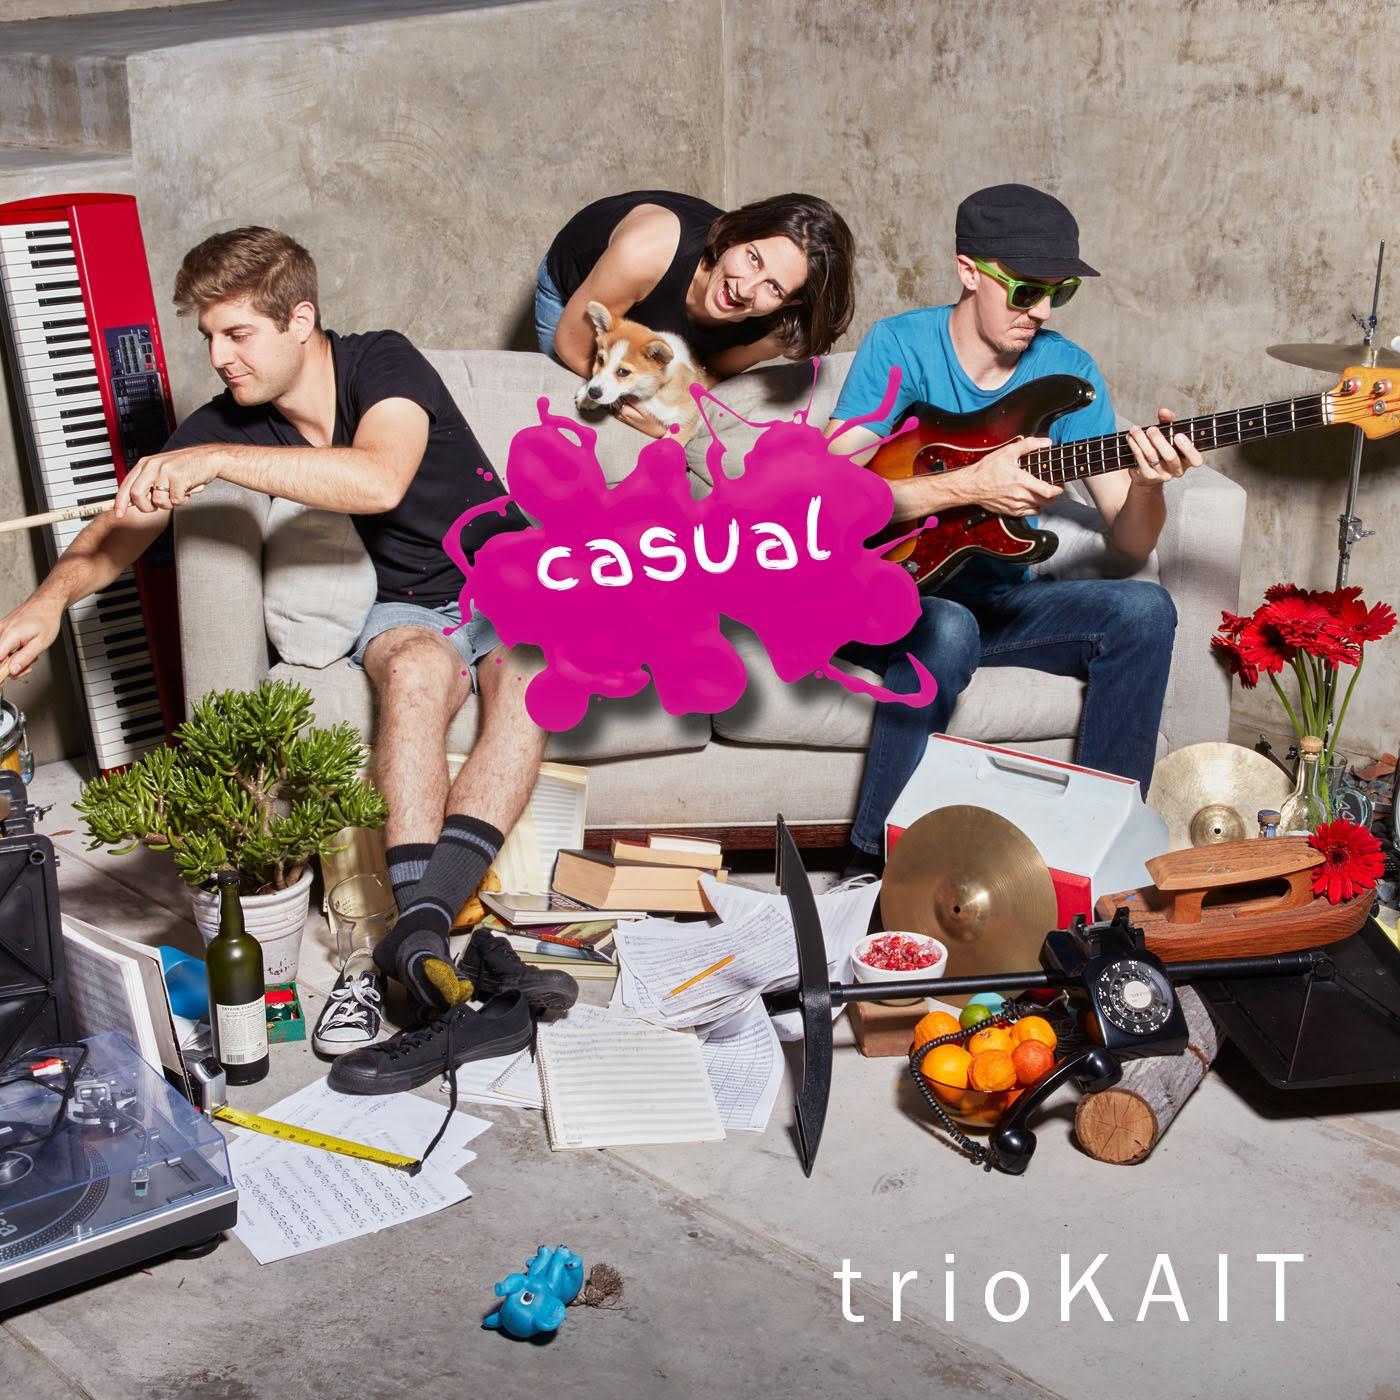 trioKAIT Album Cover 1400 x 1400 RGB.jpg